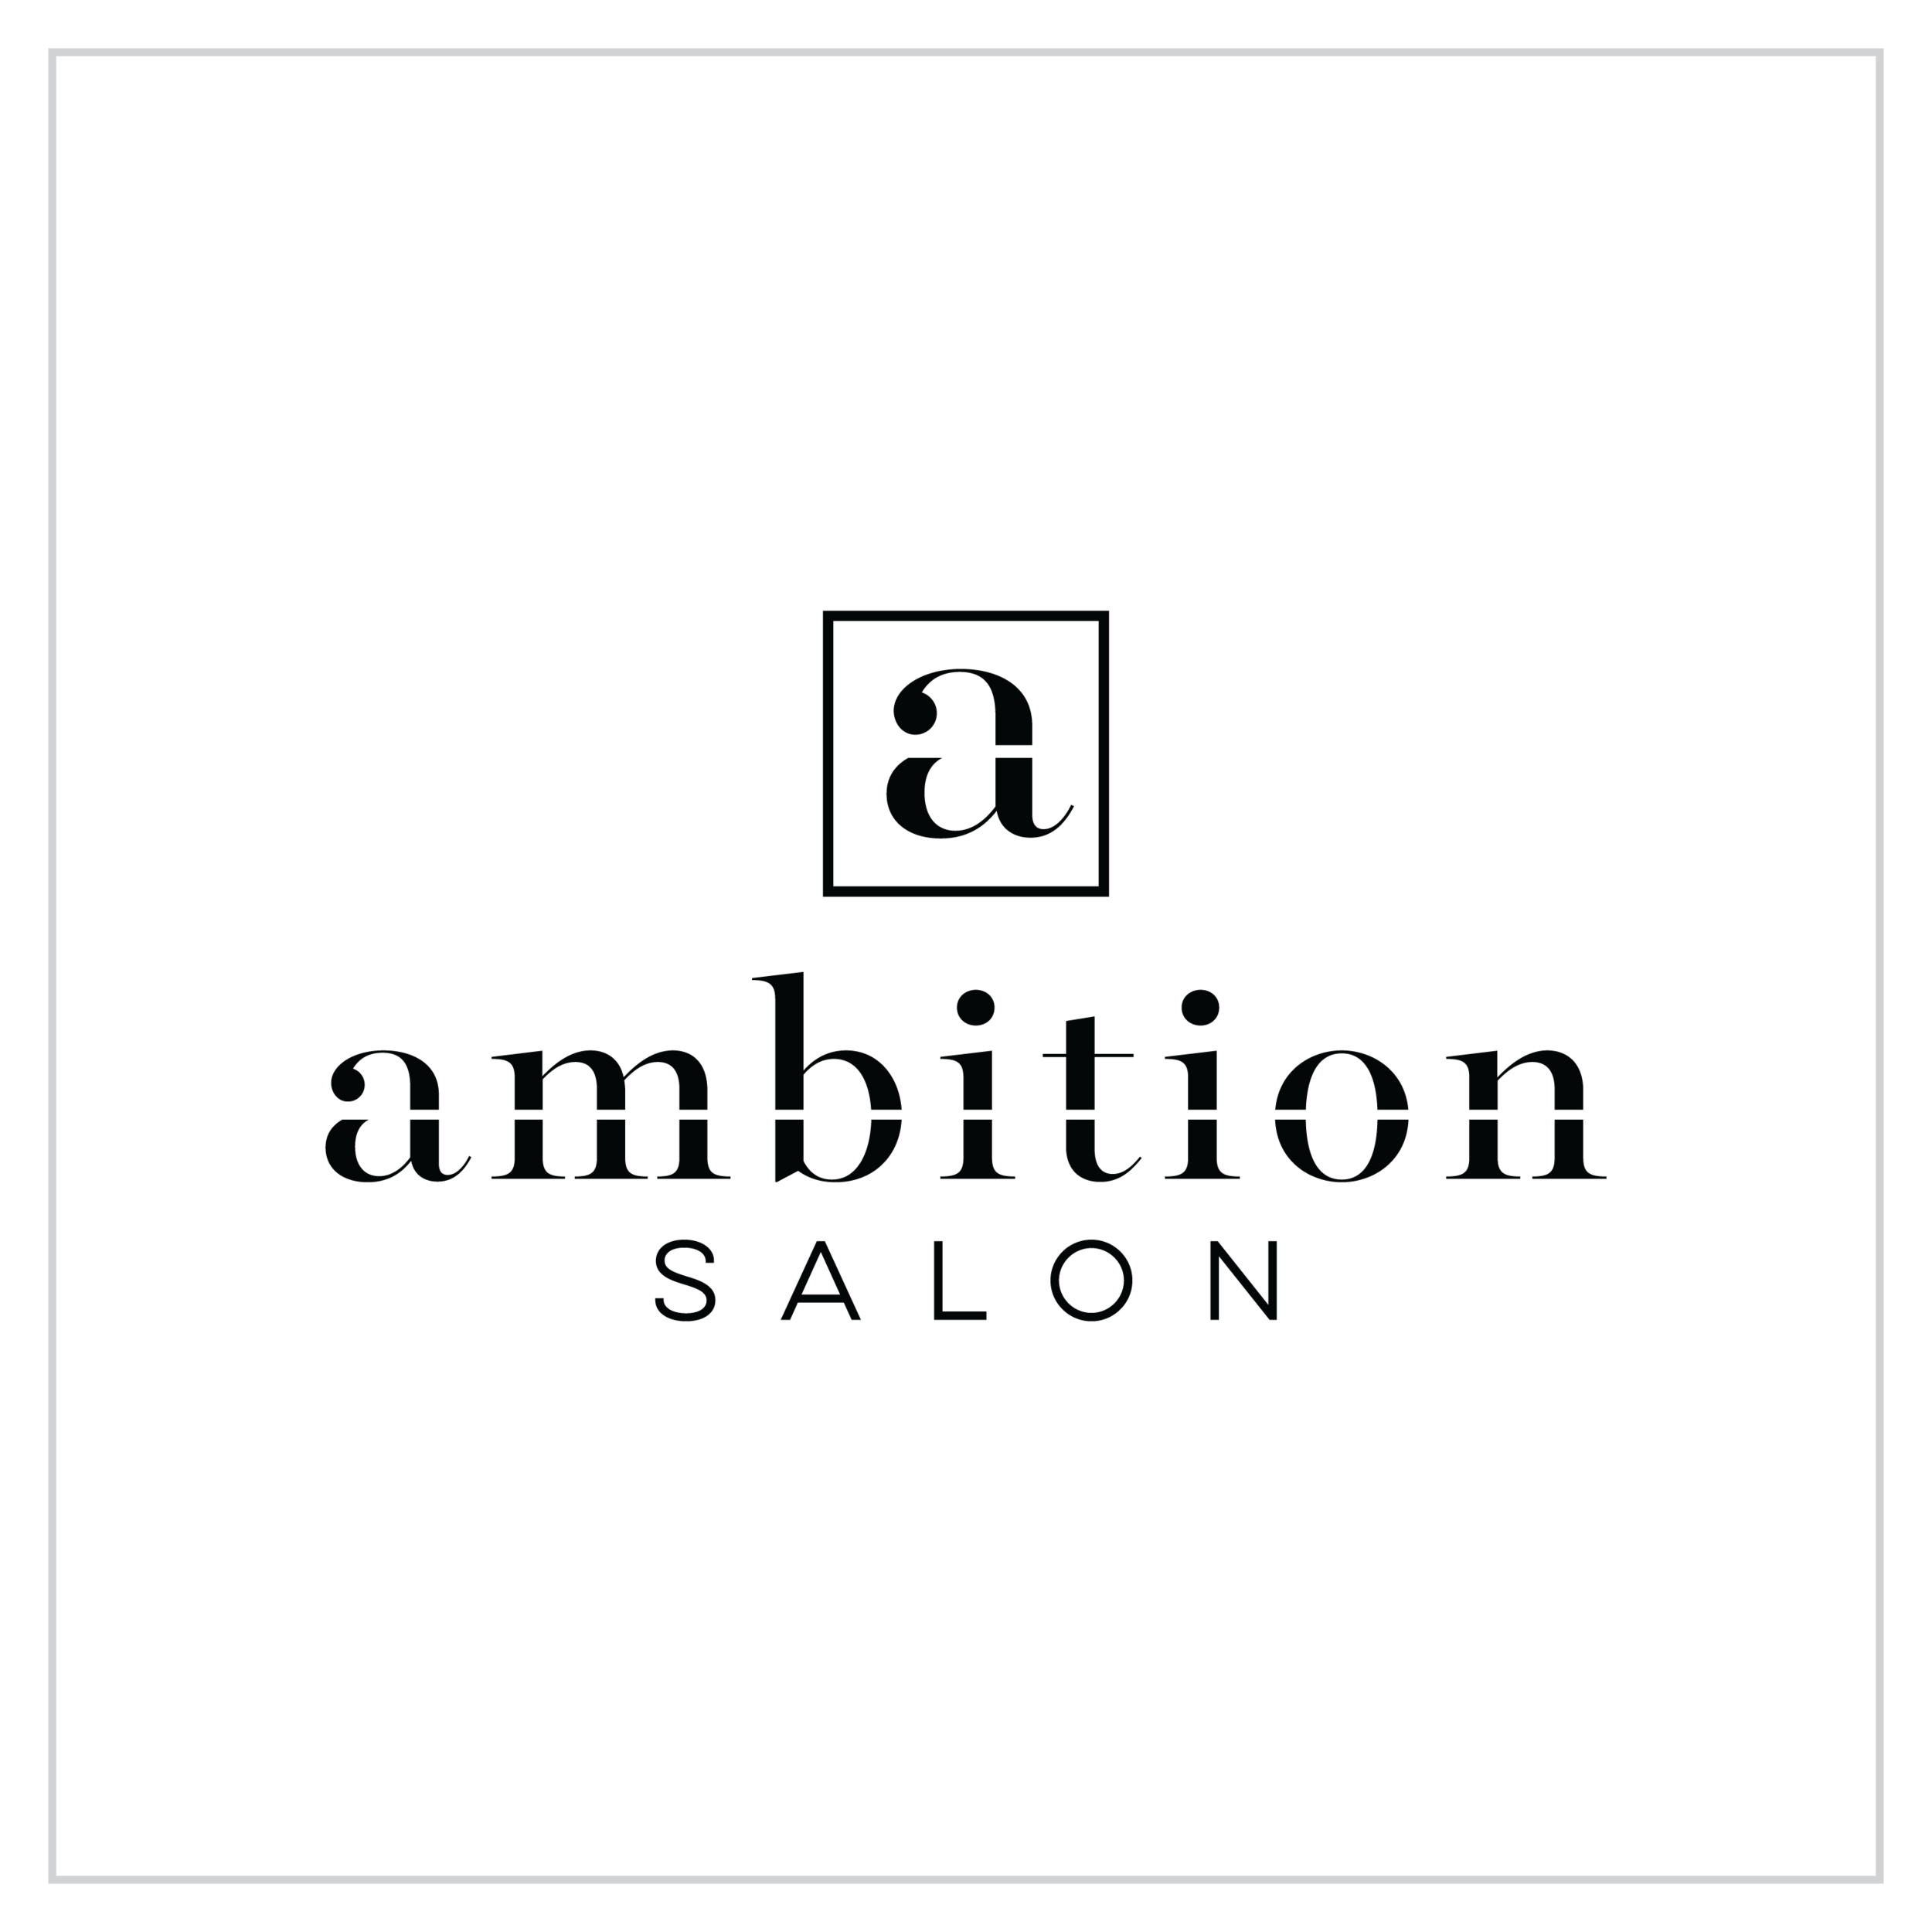 ambition-bw.png